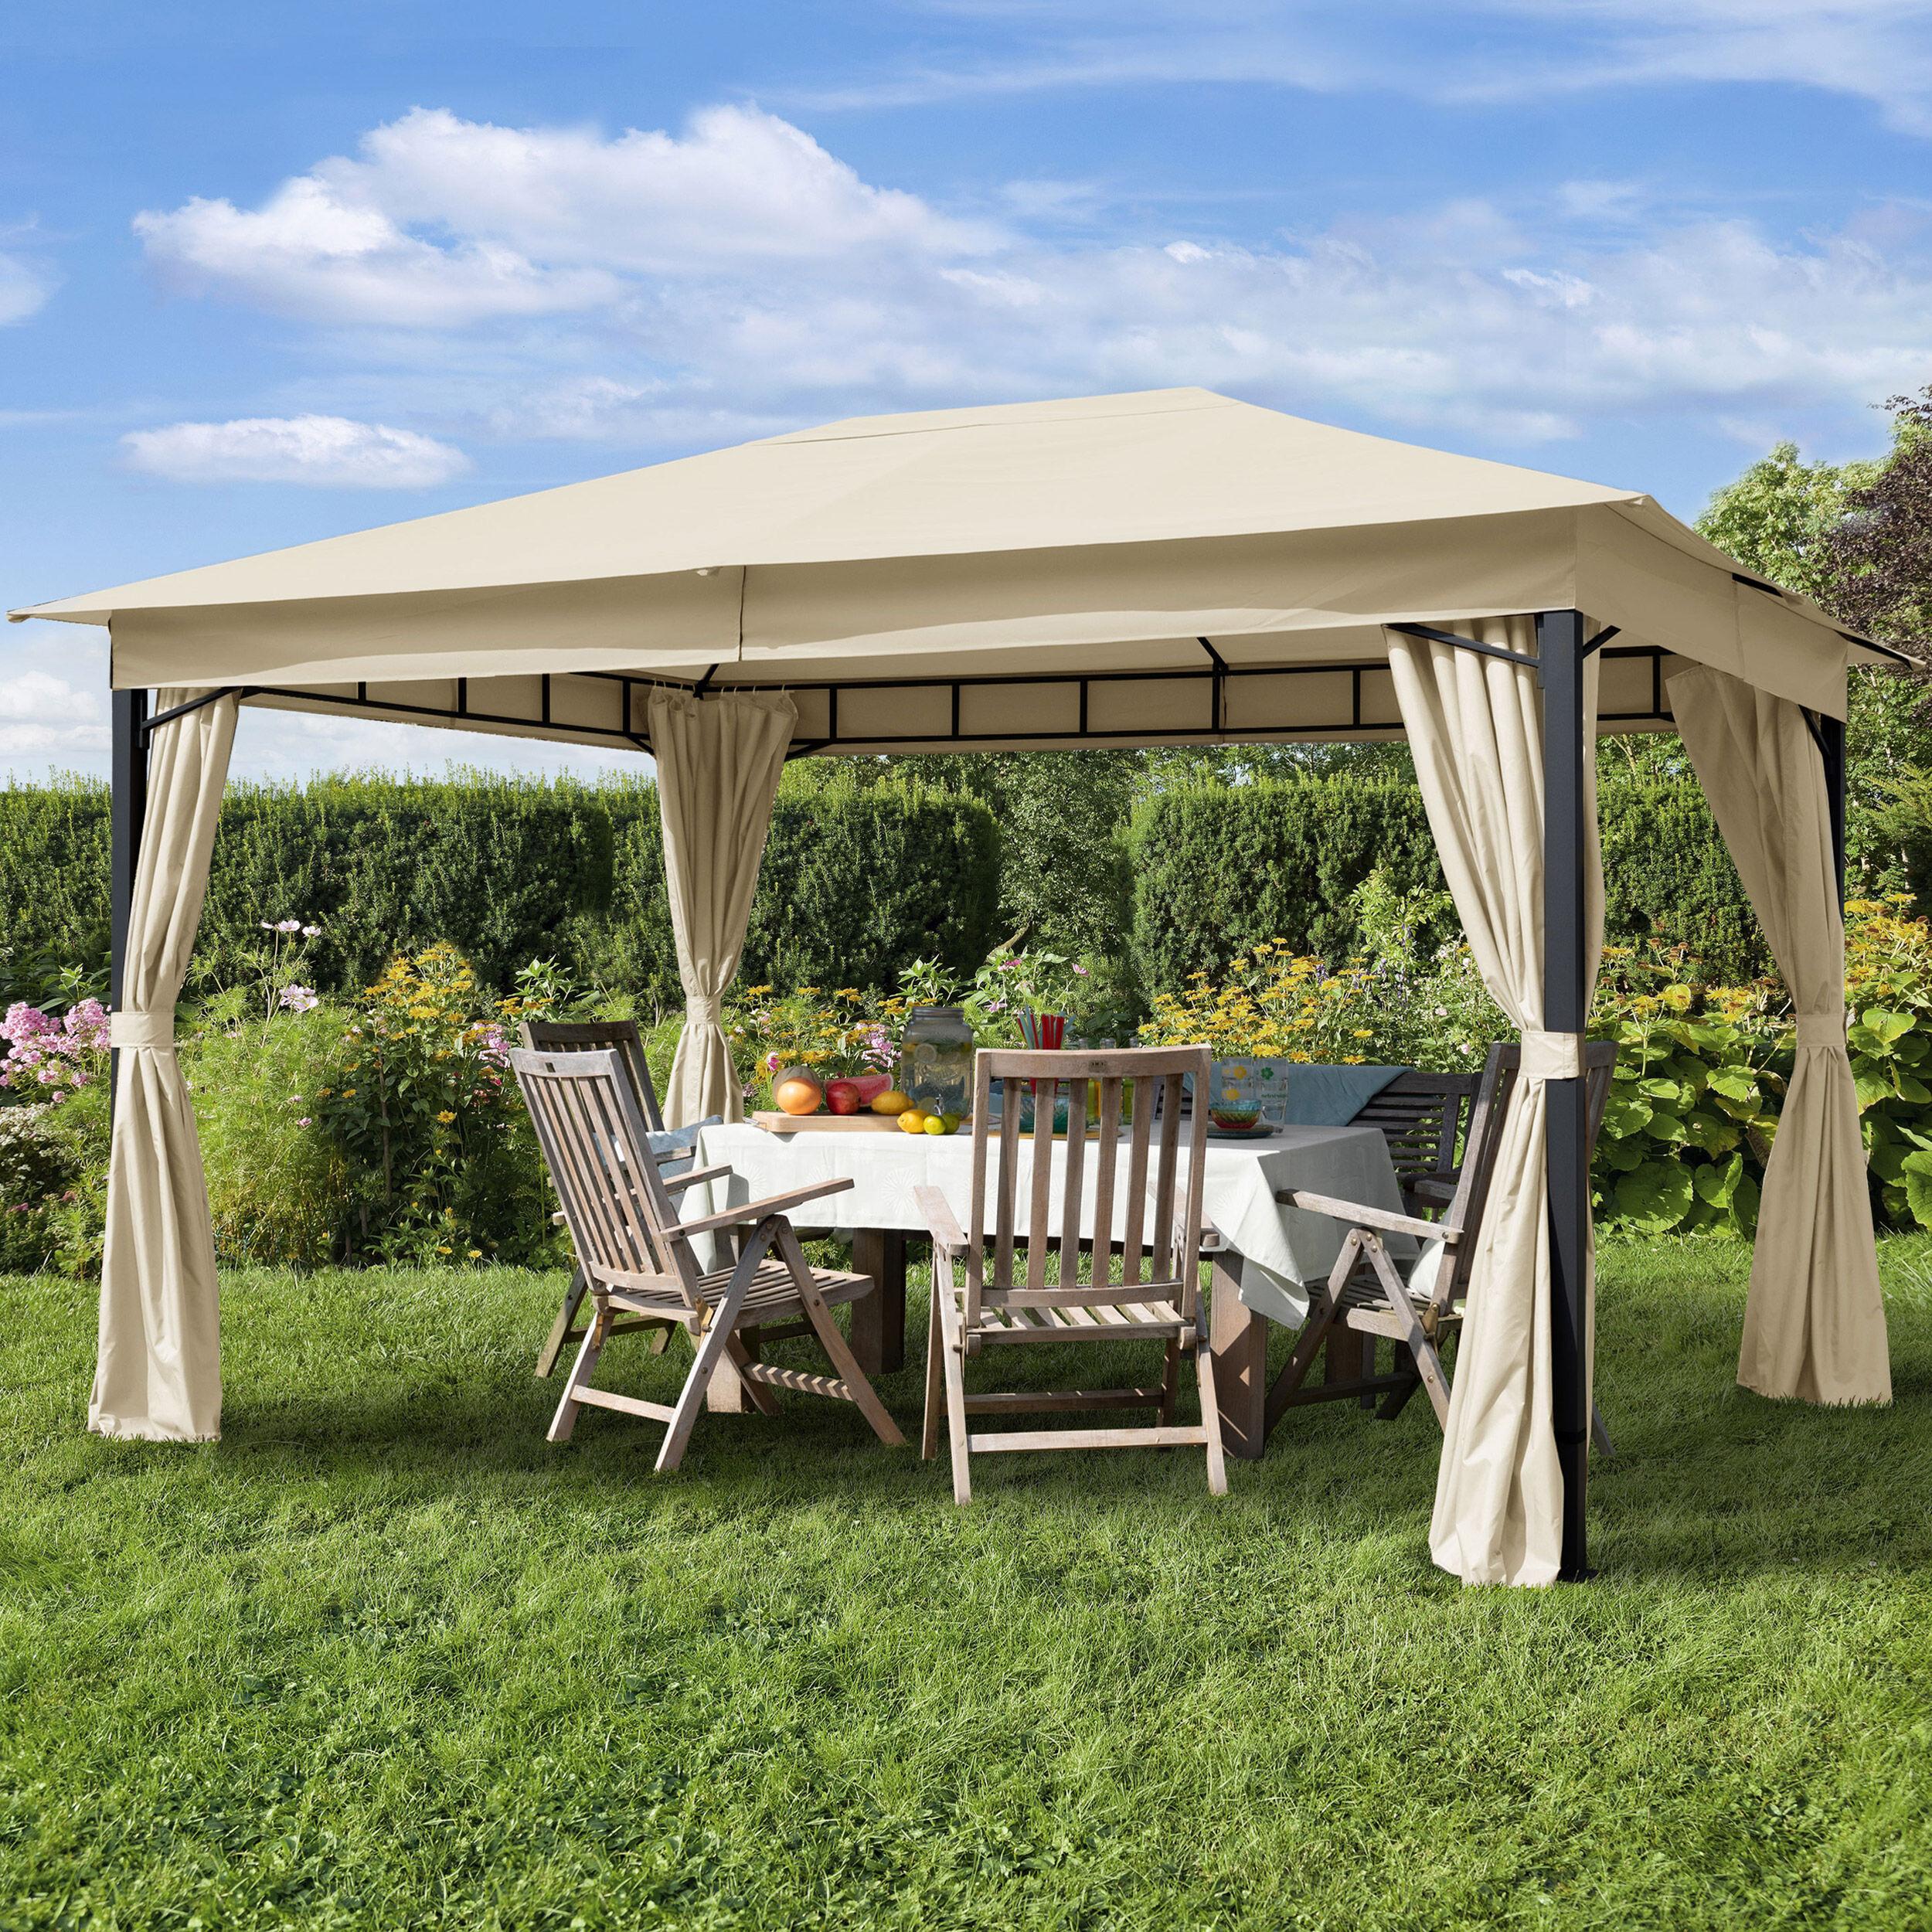 TOOLPORT Gartenpavillon 3x4m Polyester mit PU-Beschichtung 180 g/m² champagnerfarben wasserdicht